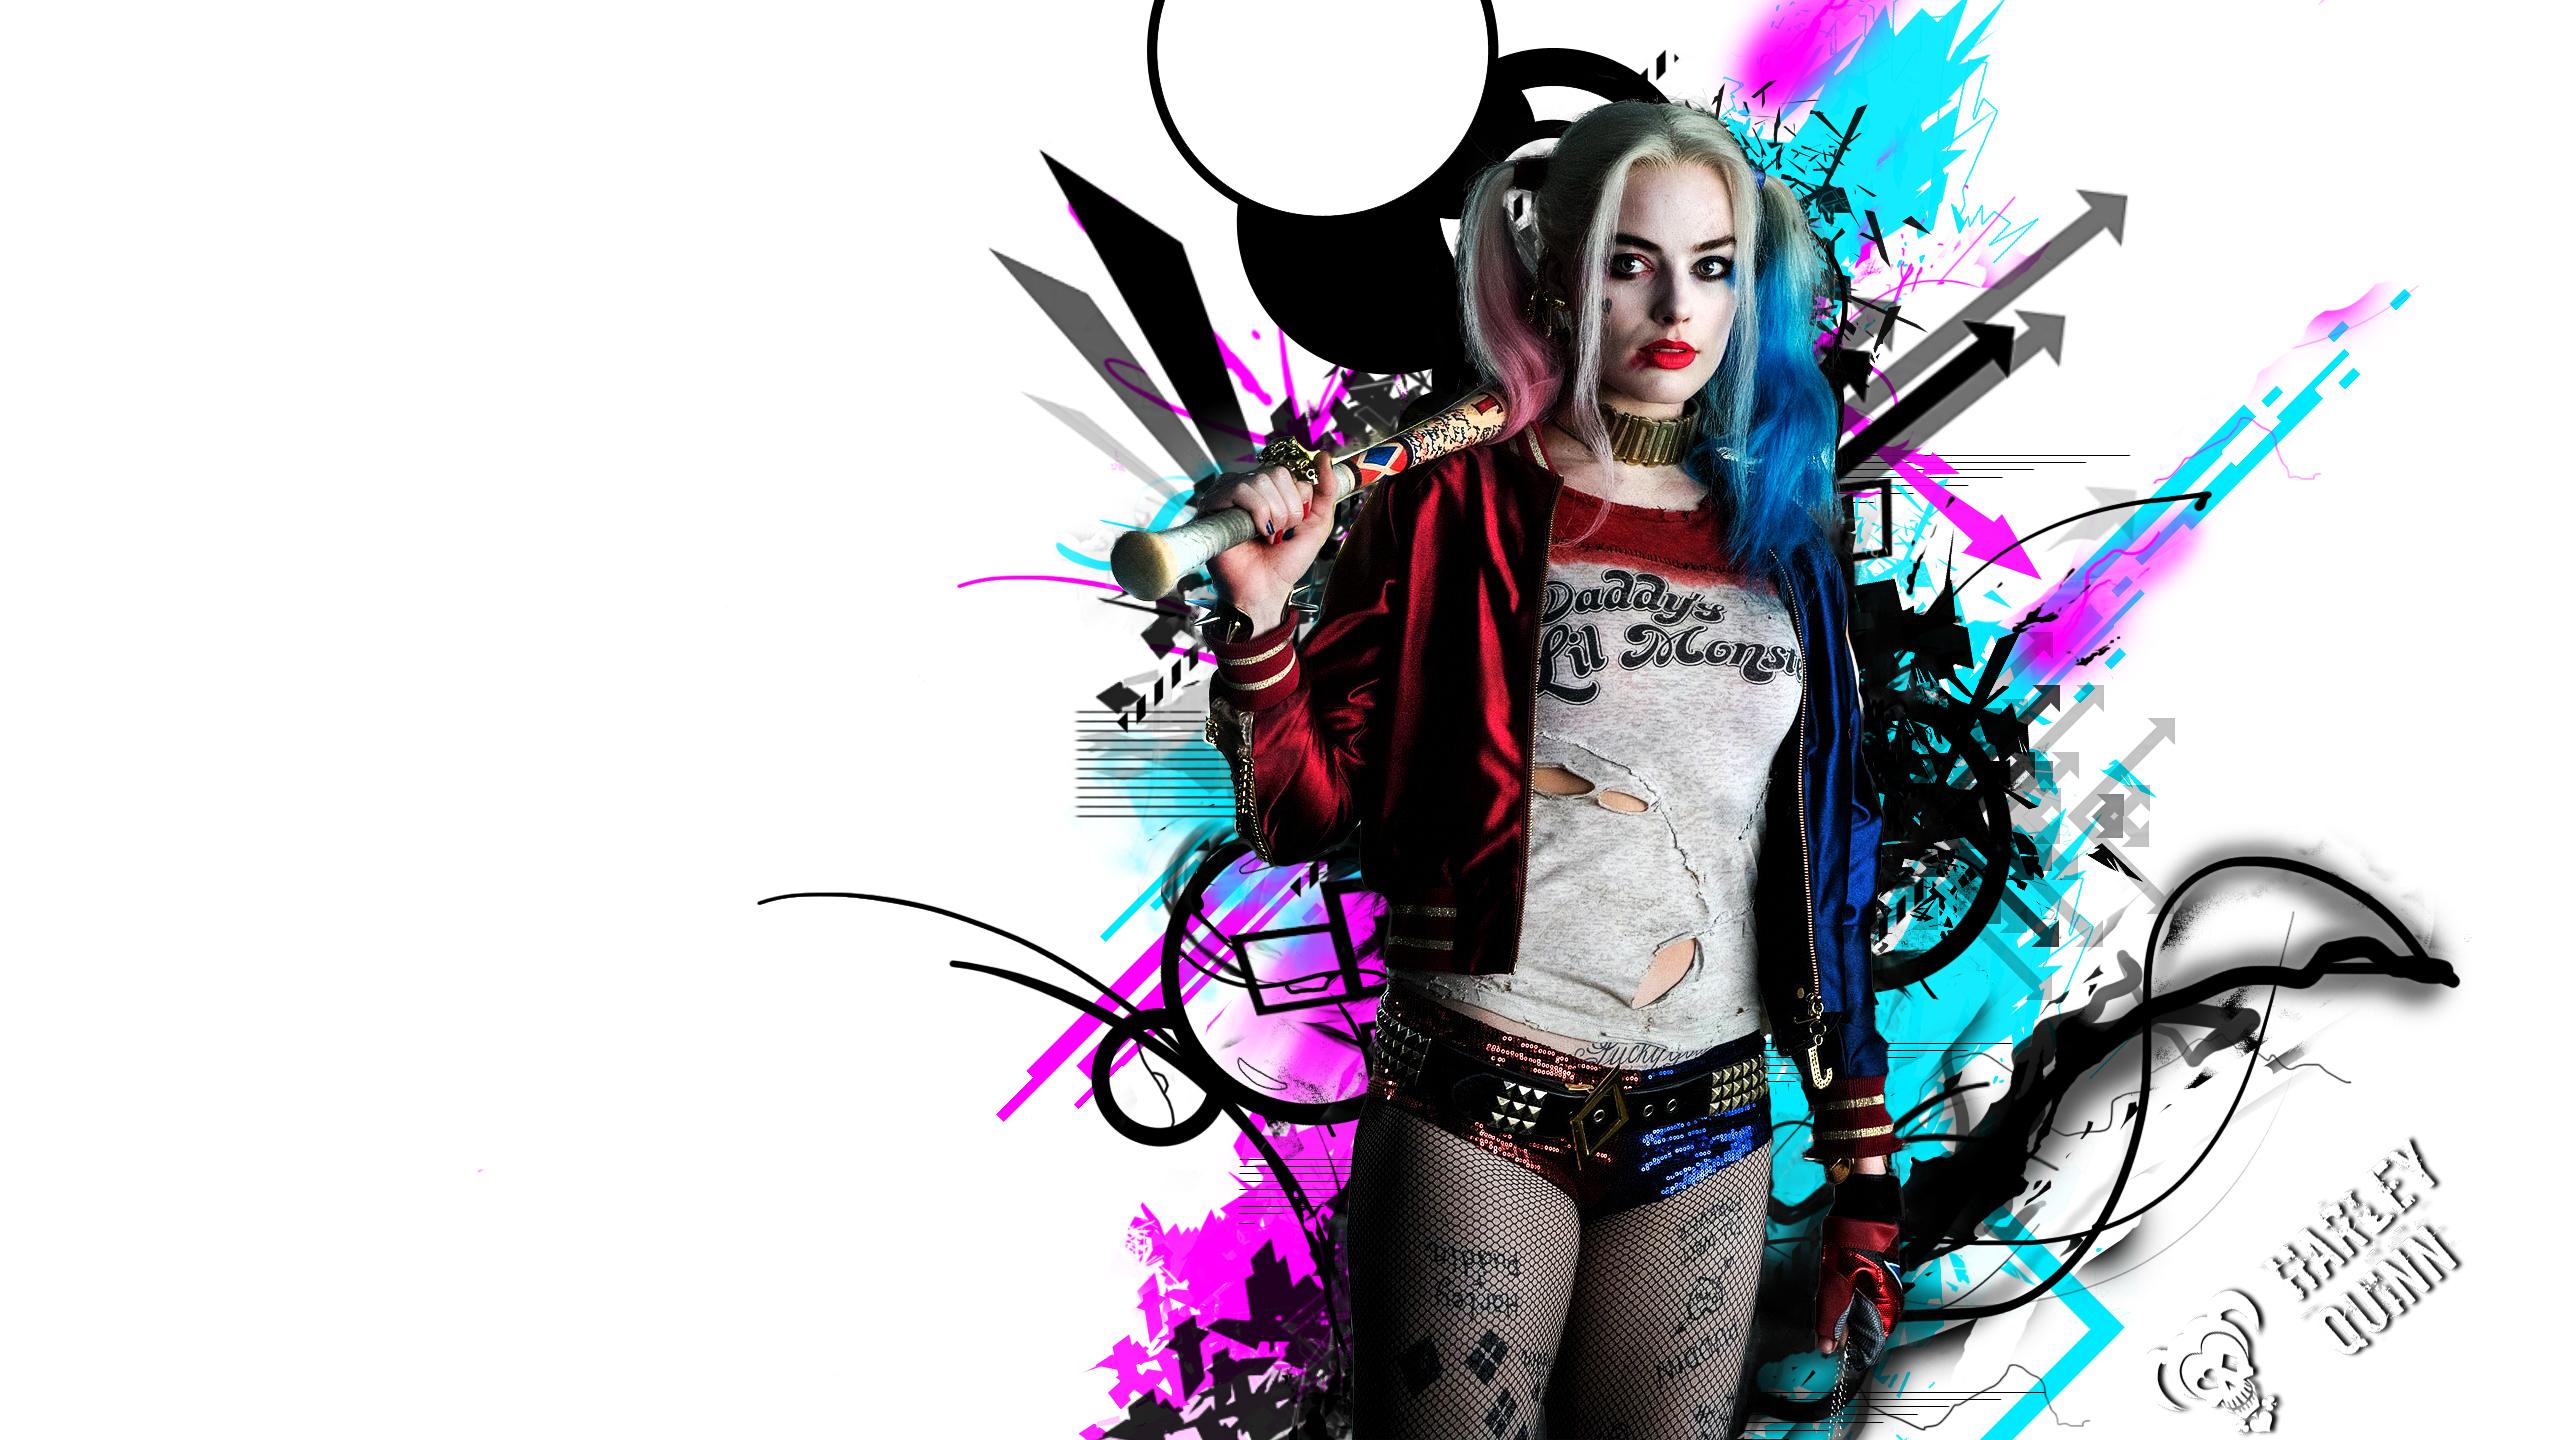 2560x1440 Harley Quinn 1440p Resolution Wallpaper Hd